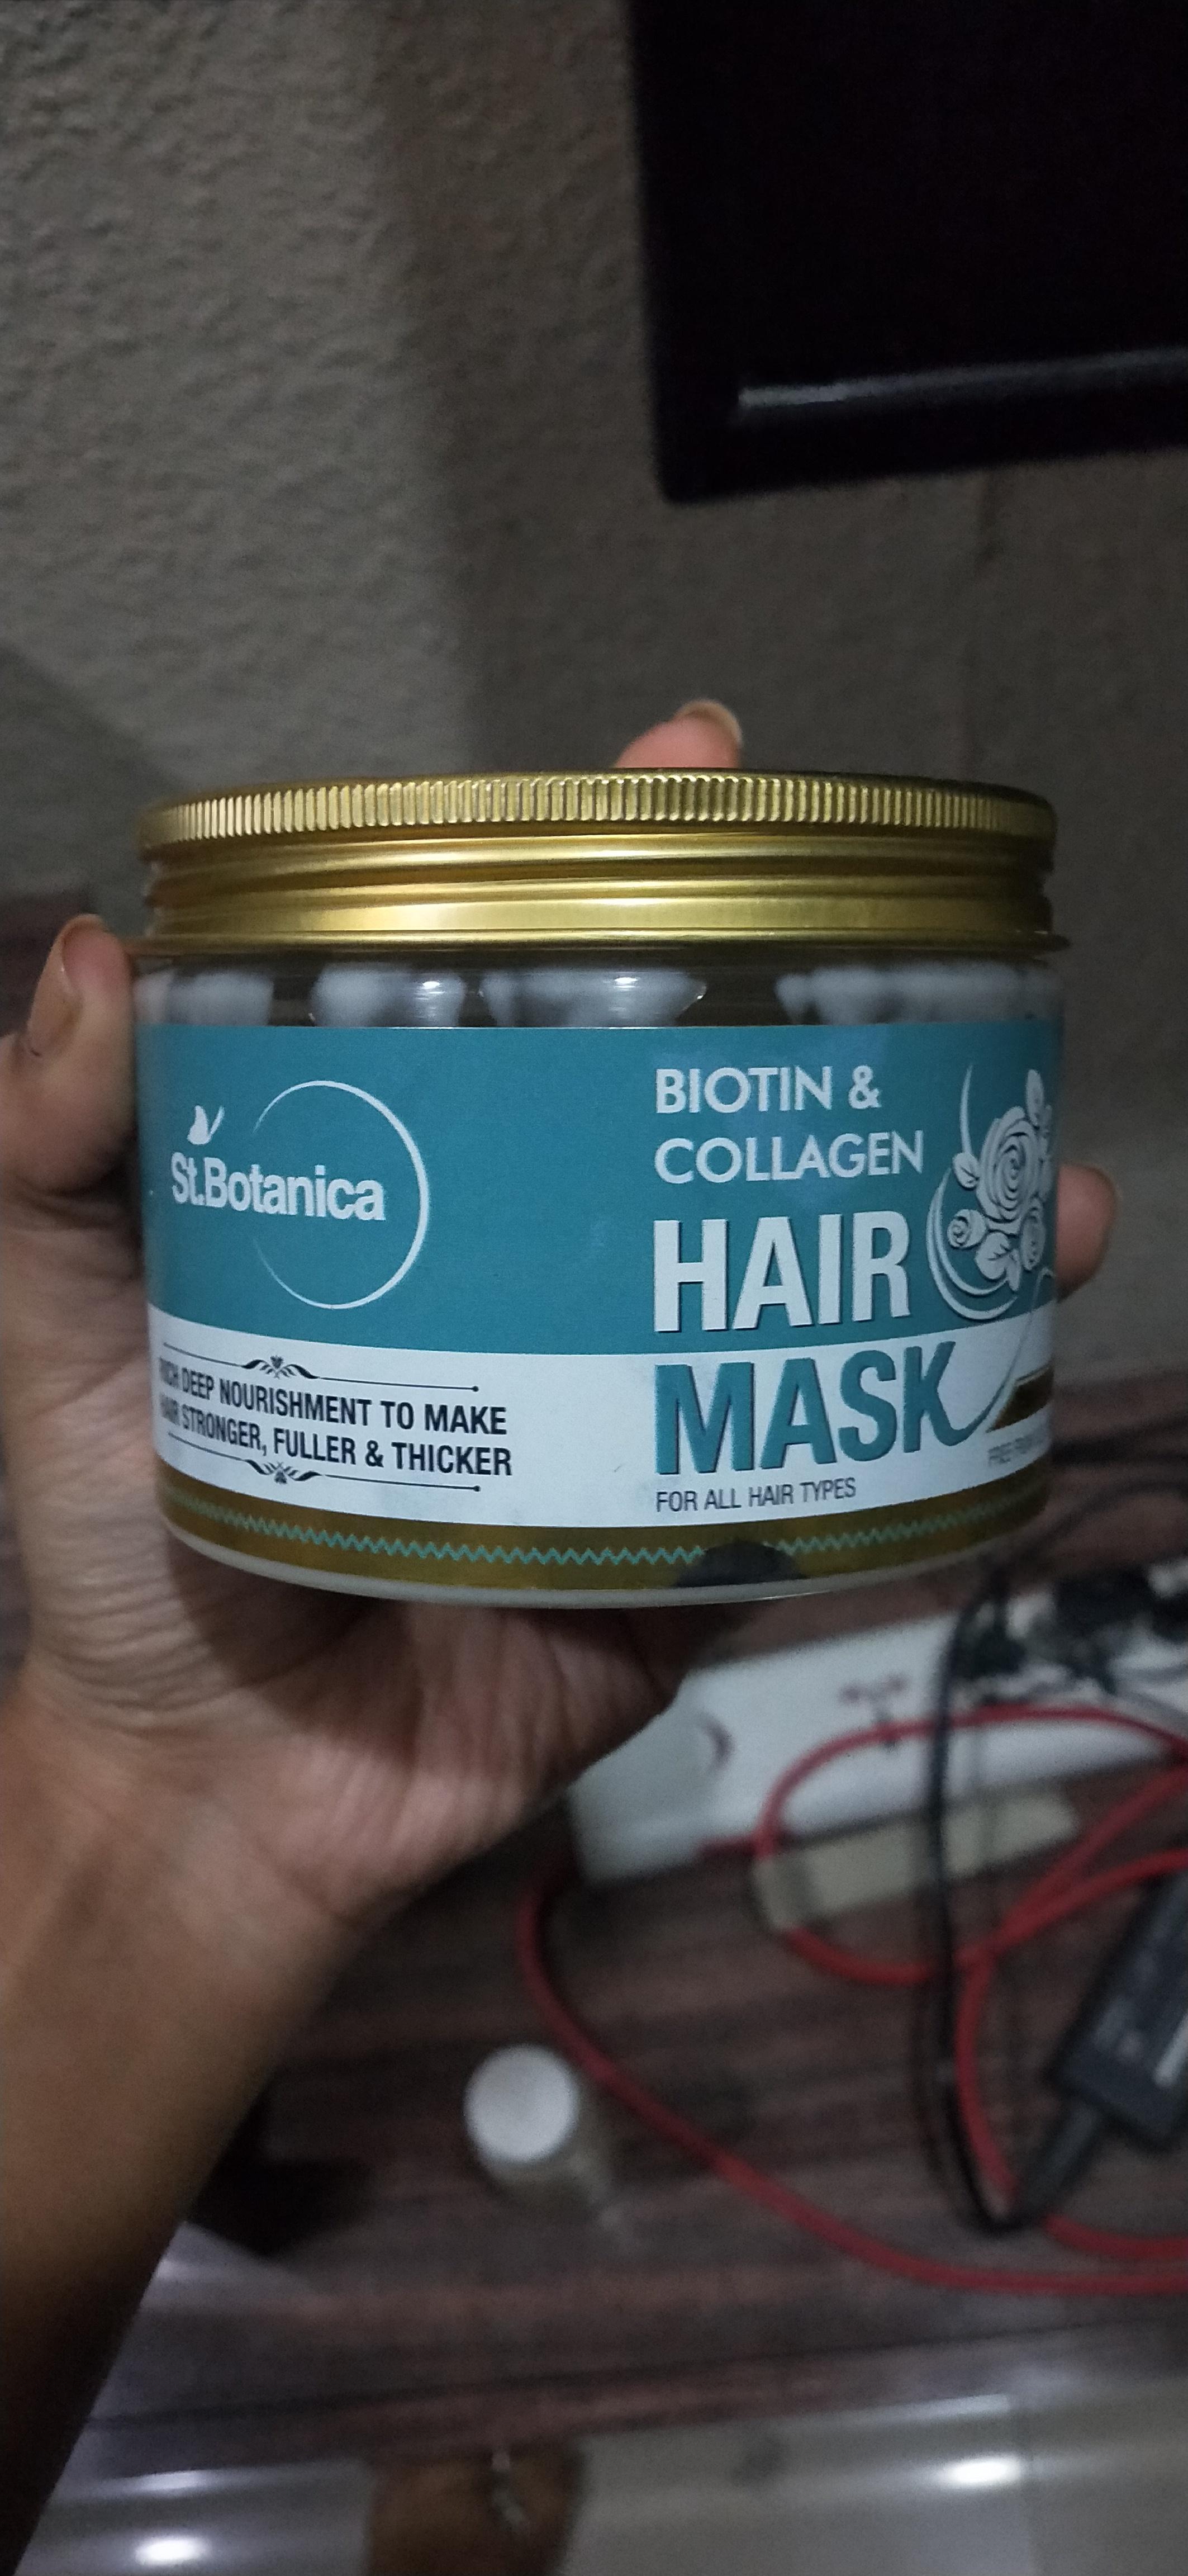 St.Botanica Biotin & Collagen Hair Mask -Okayish-By ishita_shinde